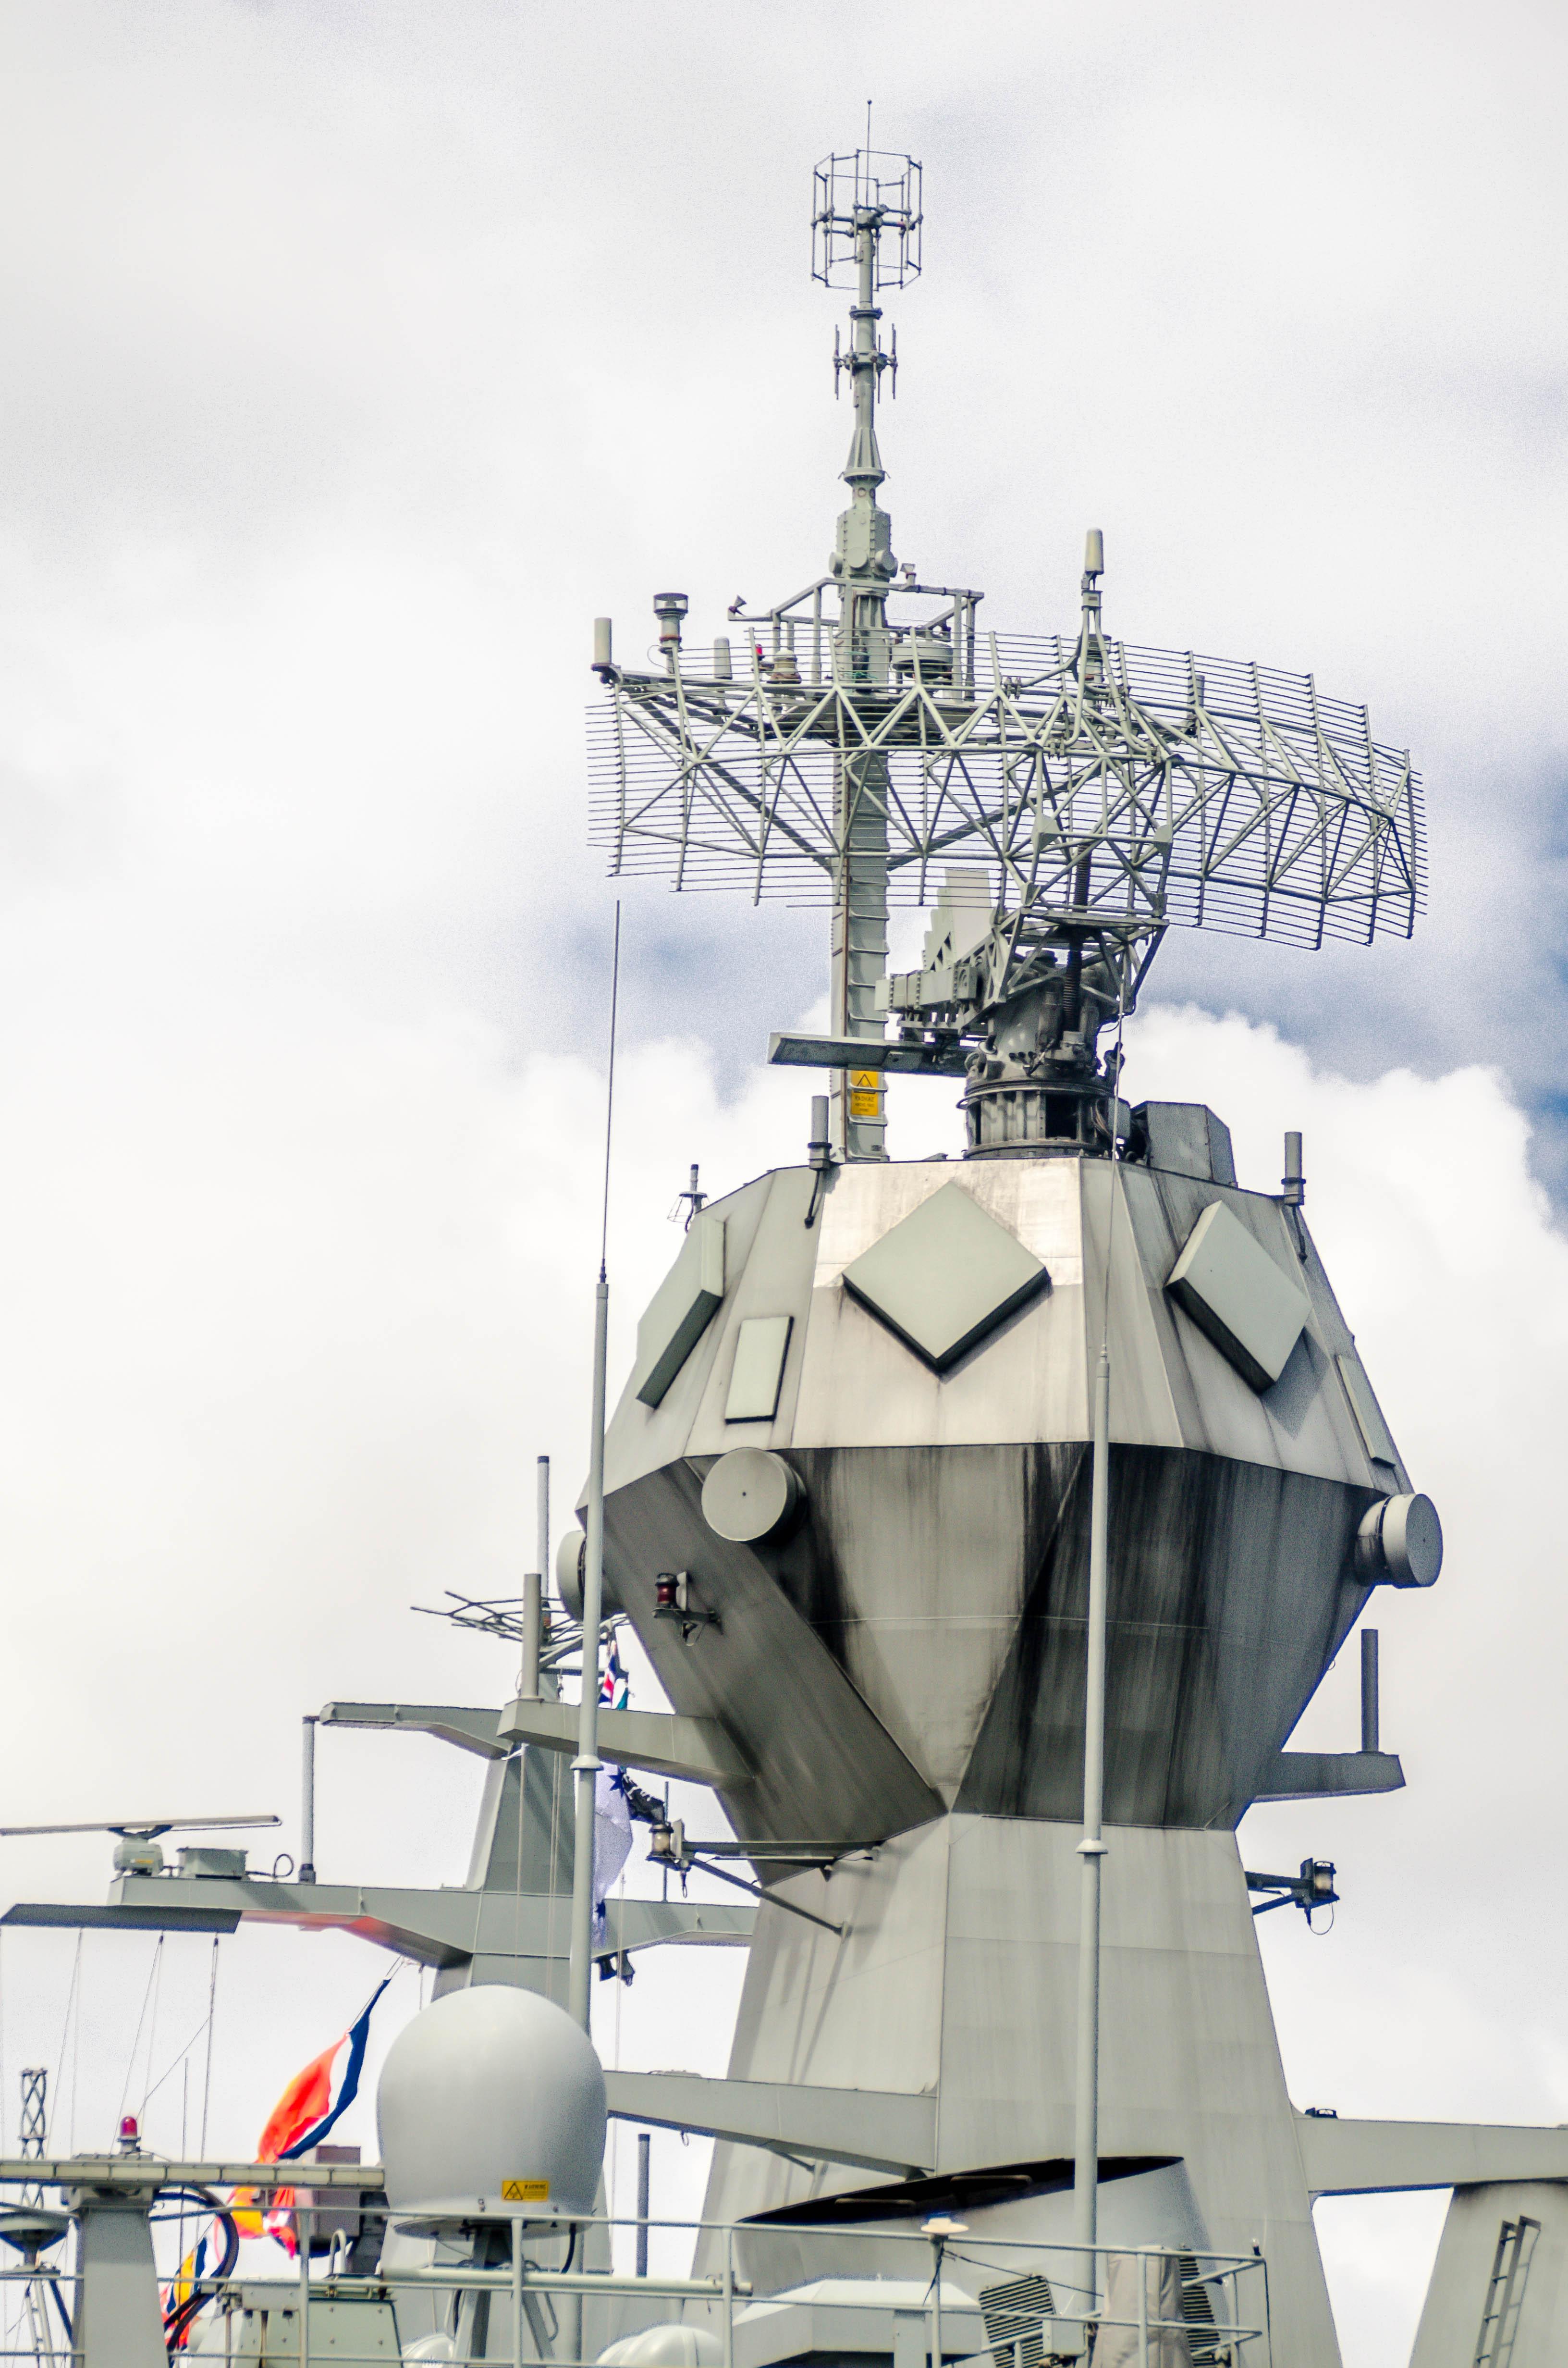 HMAS_Perth_%28FFH_157%29_CEAFAR_phased_array_radars.jpg